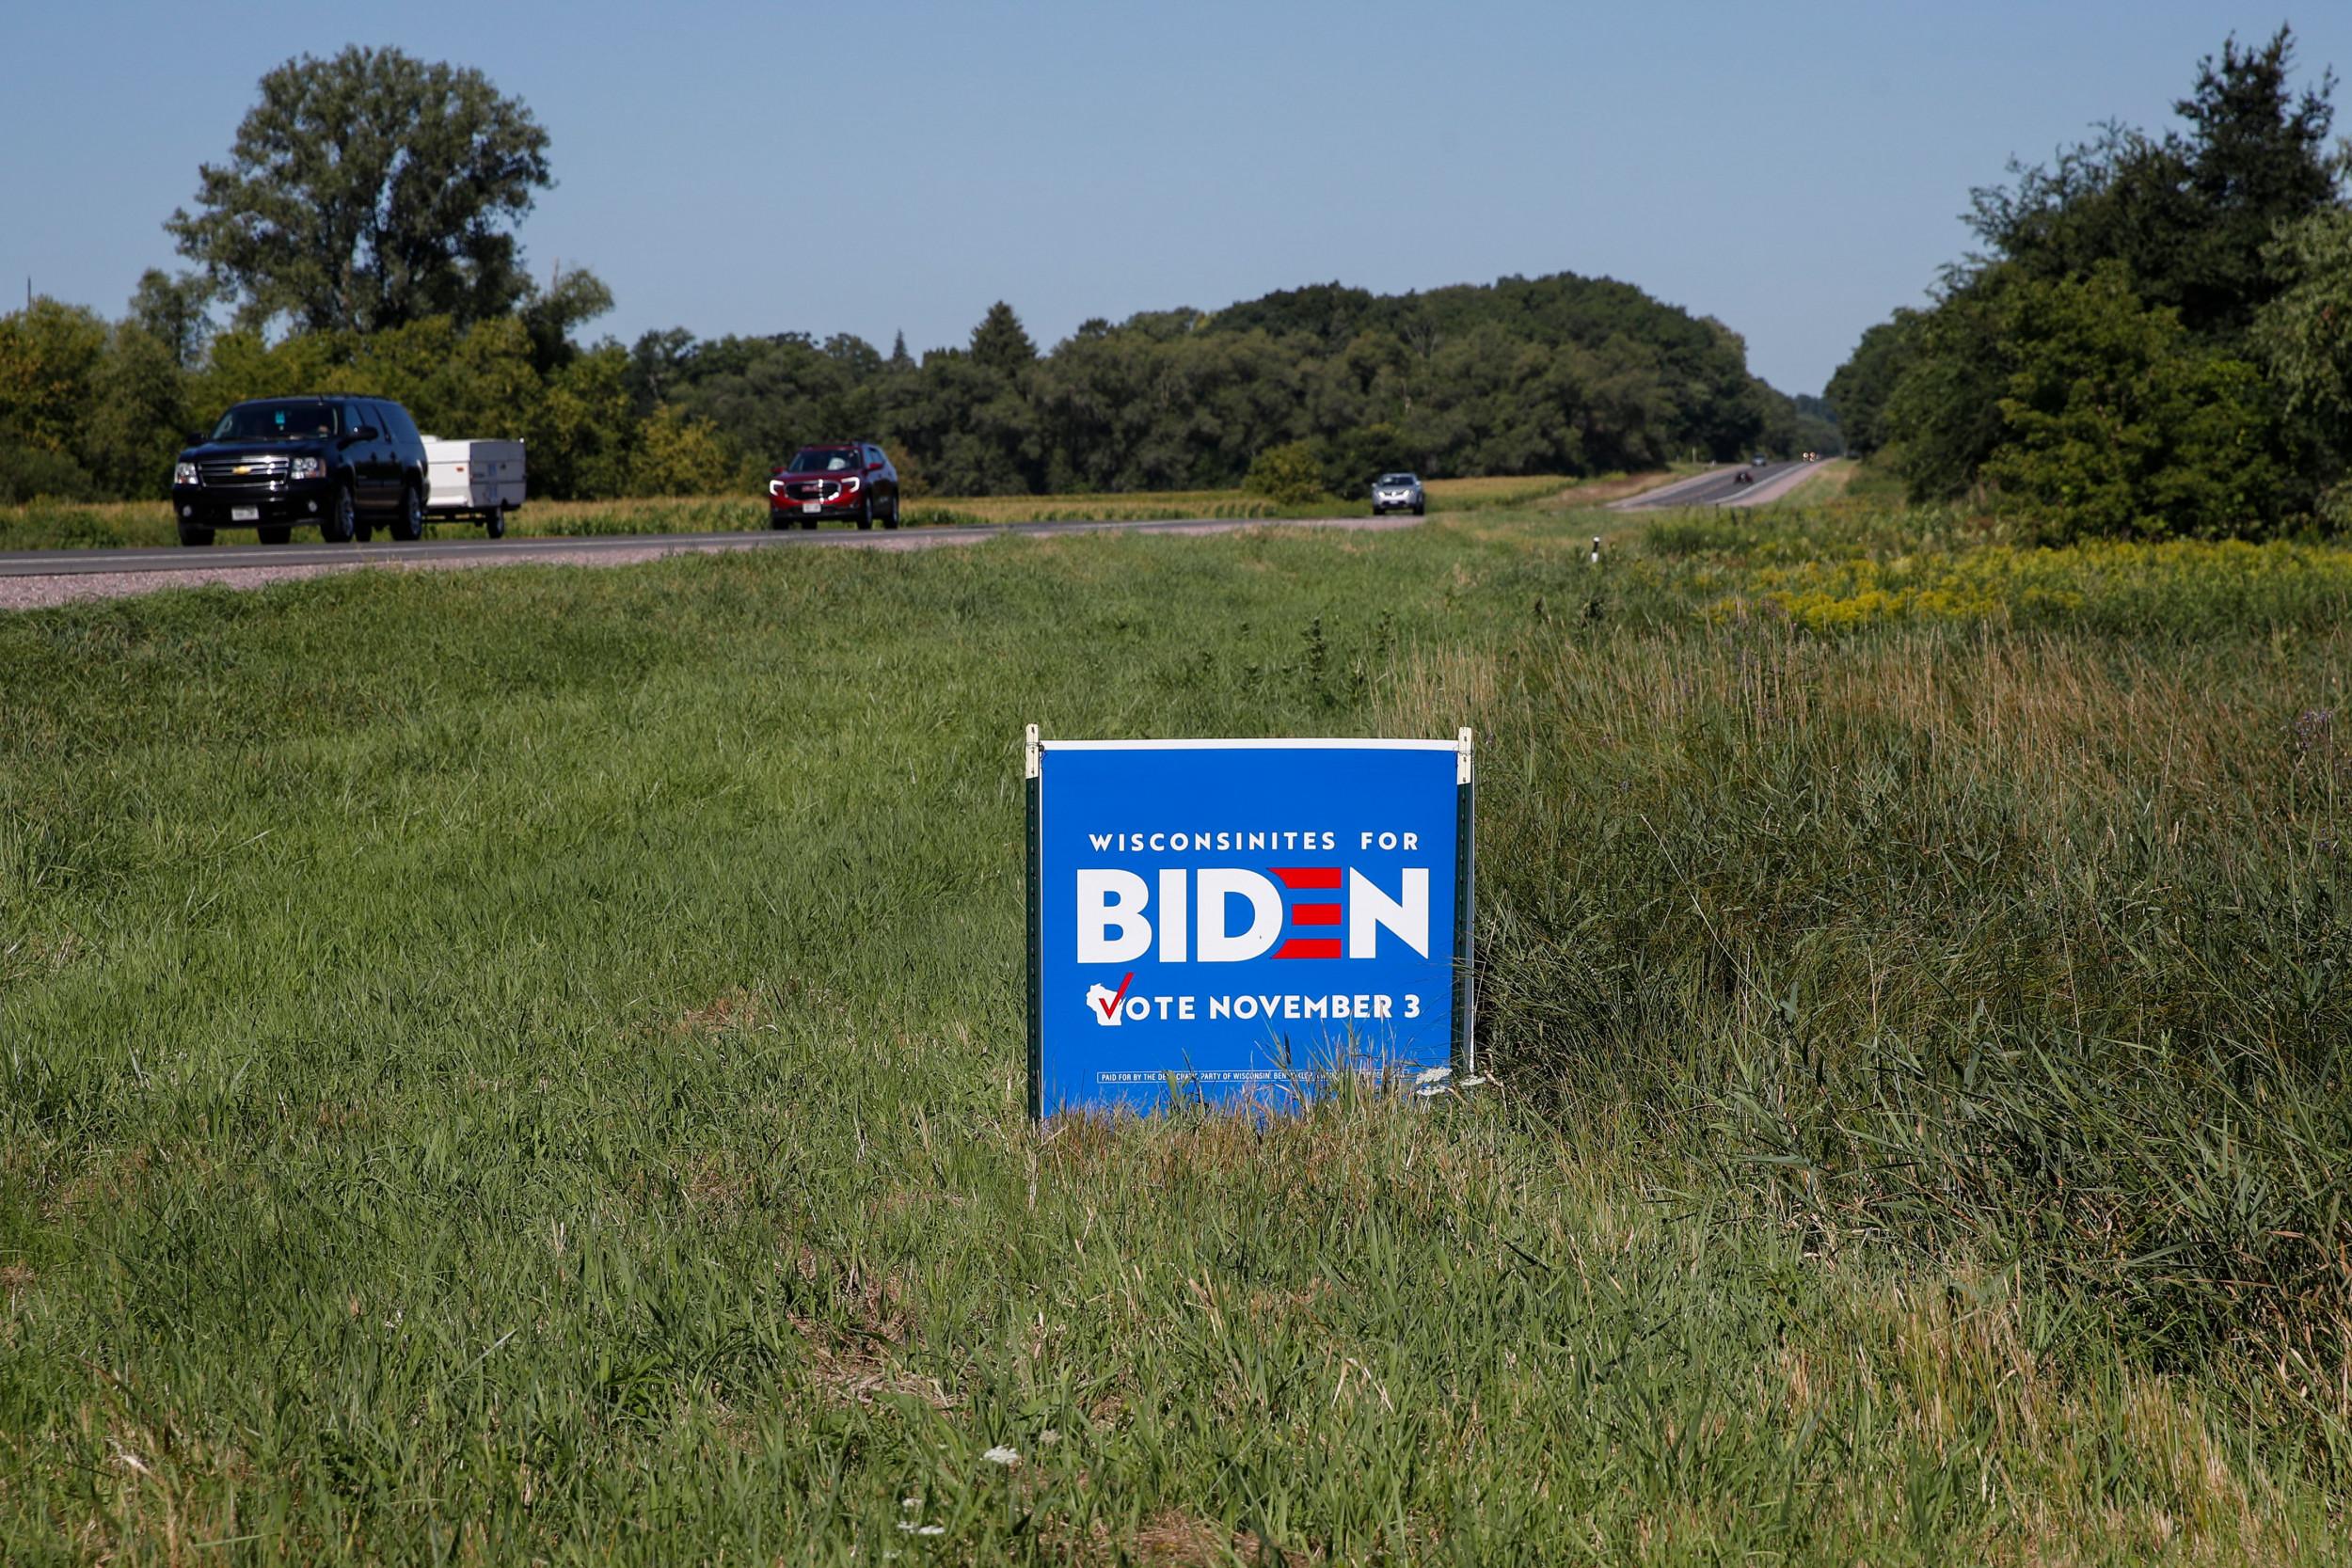 Joe Biden Donald Trump Campaign Yard Signs Pilfered In Florida County